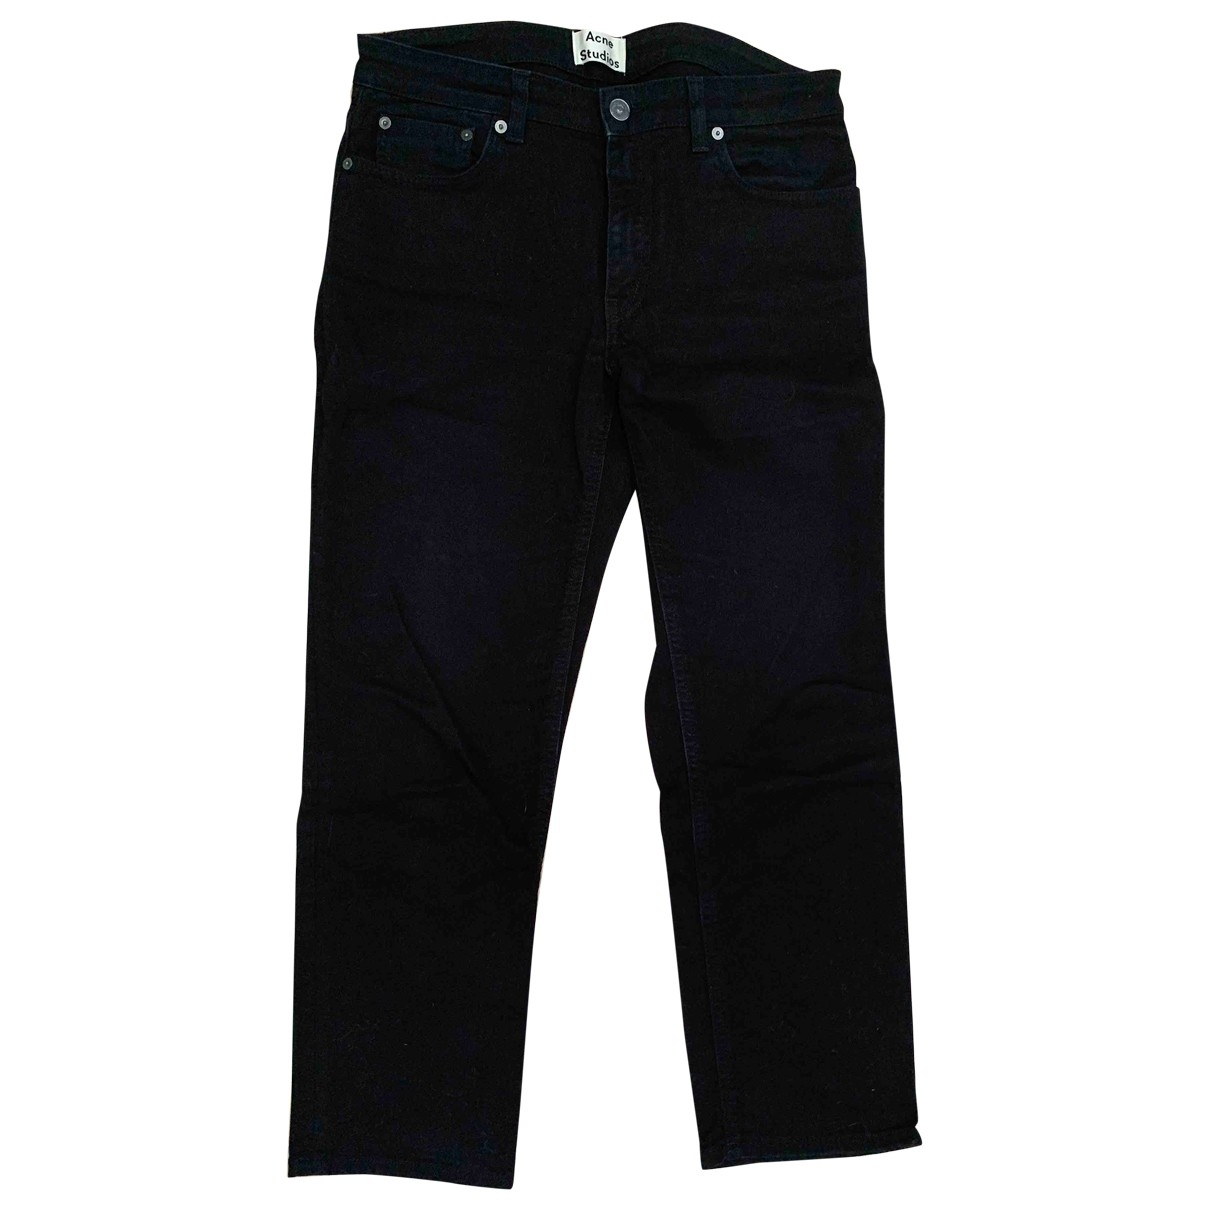 Acne Studios Row Black Cotton - elasthane Jeans for Women 29 US